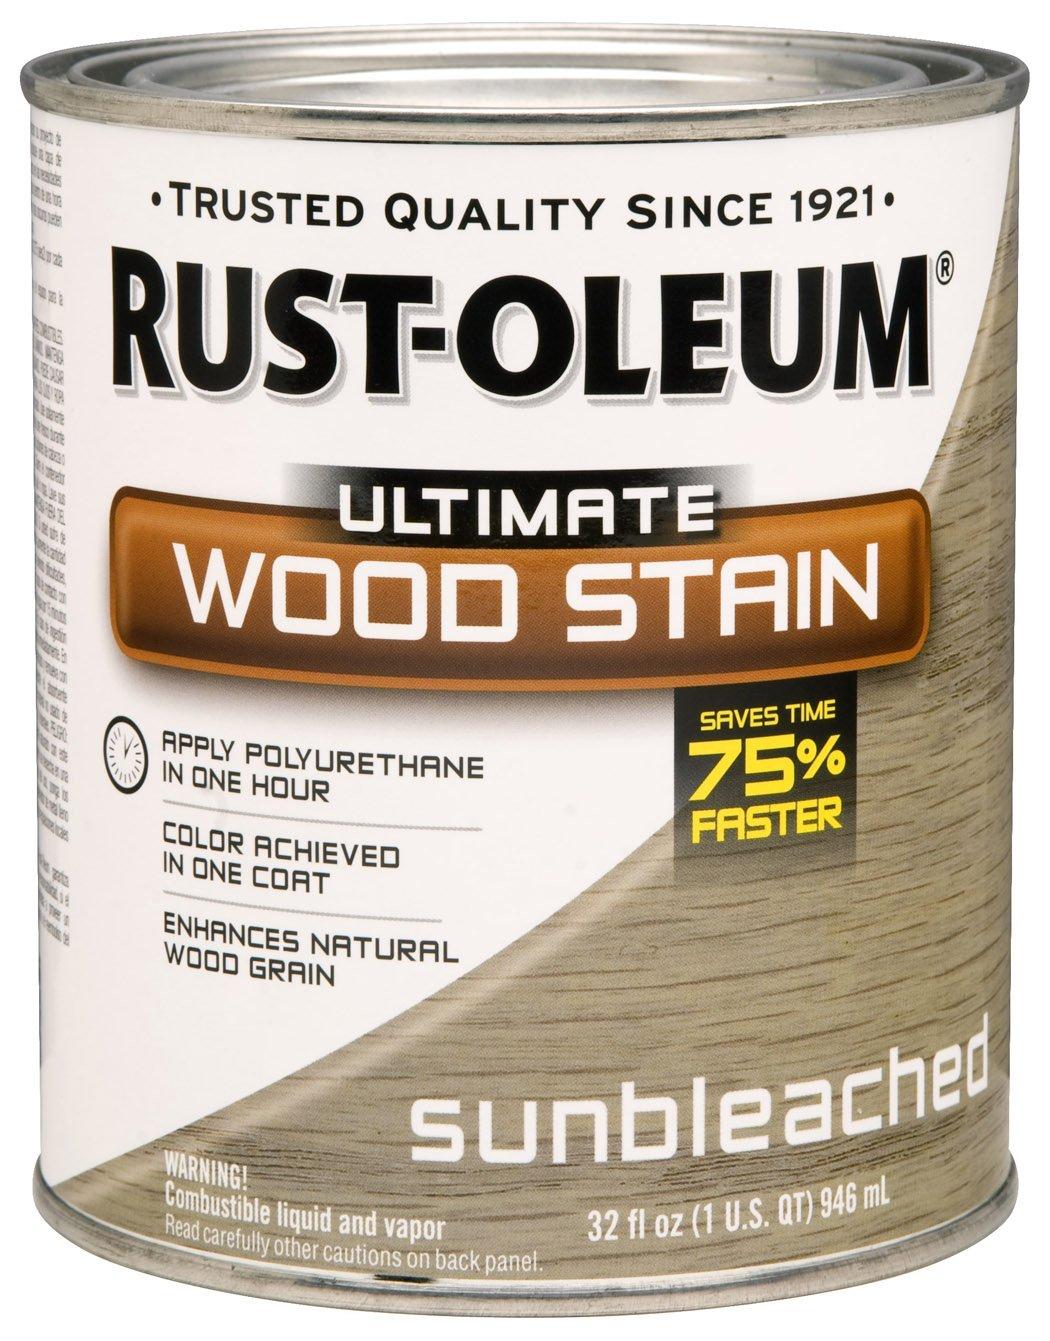 Rustoleum Driftwood Stain Amazoncom Rust Oleum 260155 Ultimate Wood Stain Quart